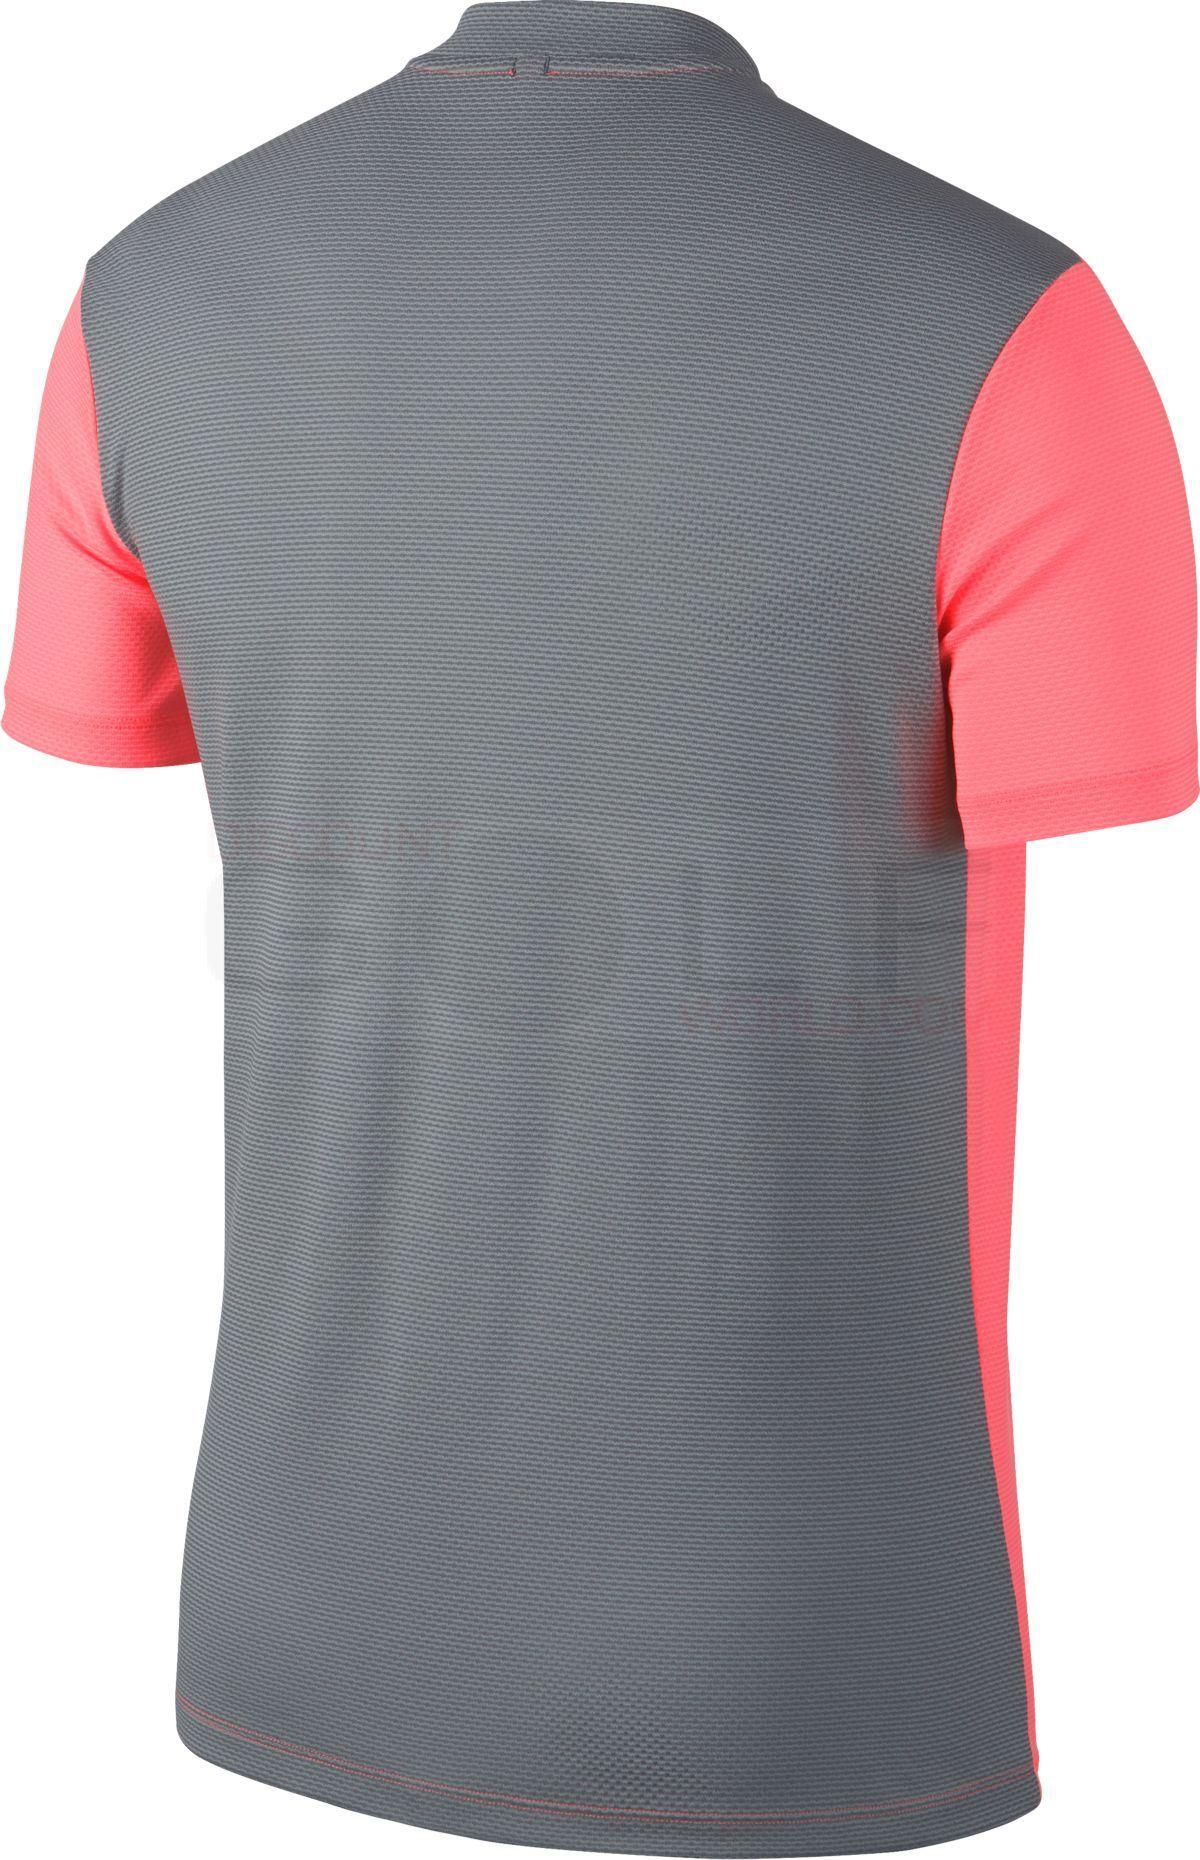 96df5eeba8 ... Camisas Pólo e muito mais! Nike MM Fly Aero React Blade Polo 833153  Dri-Fit